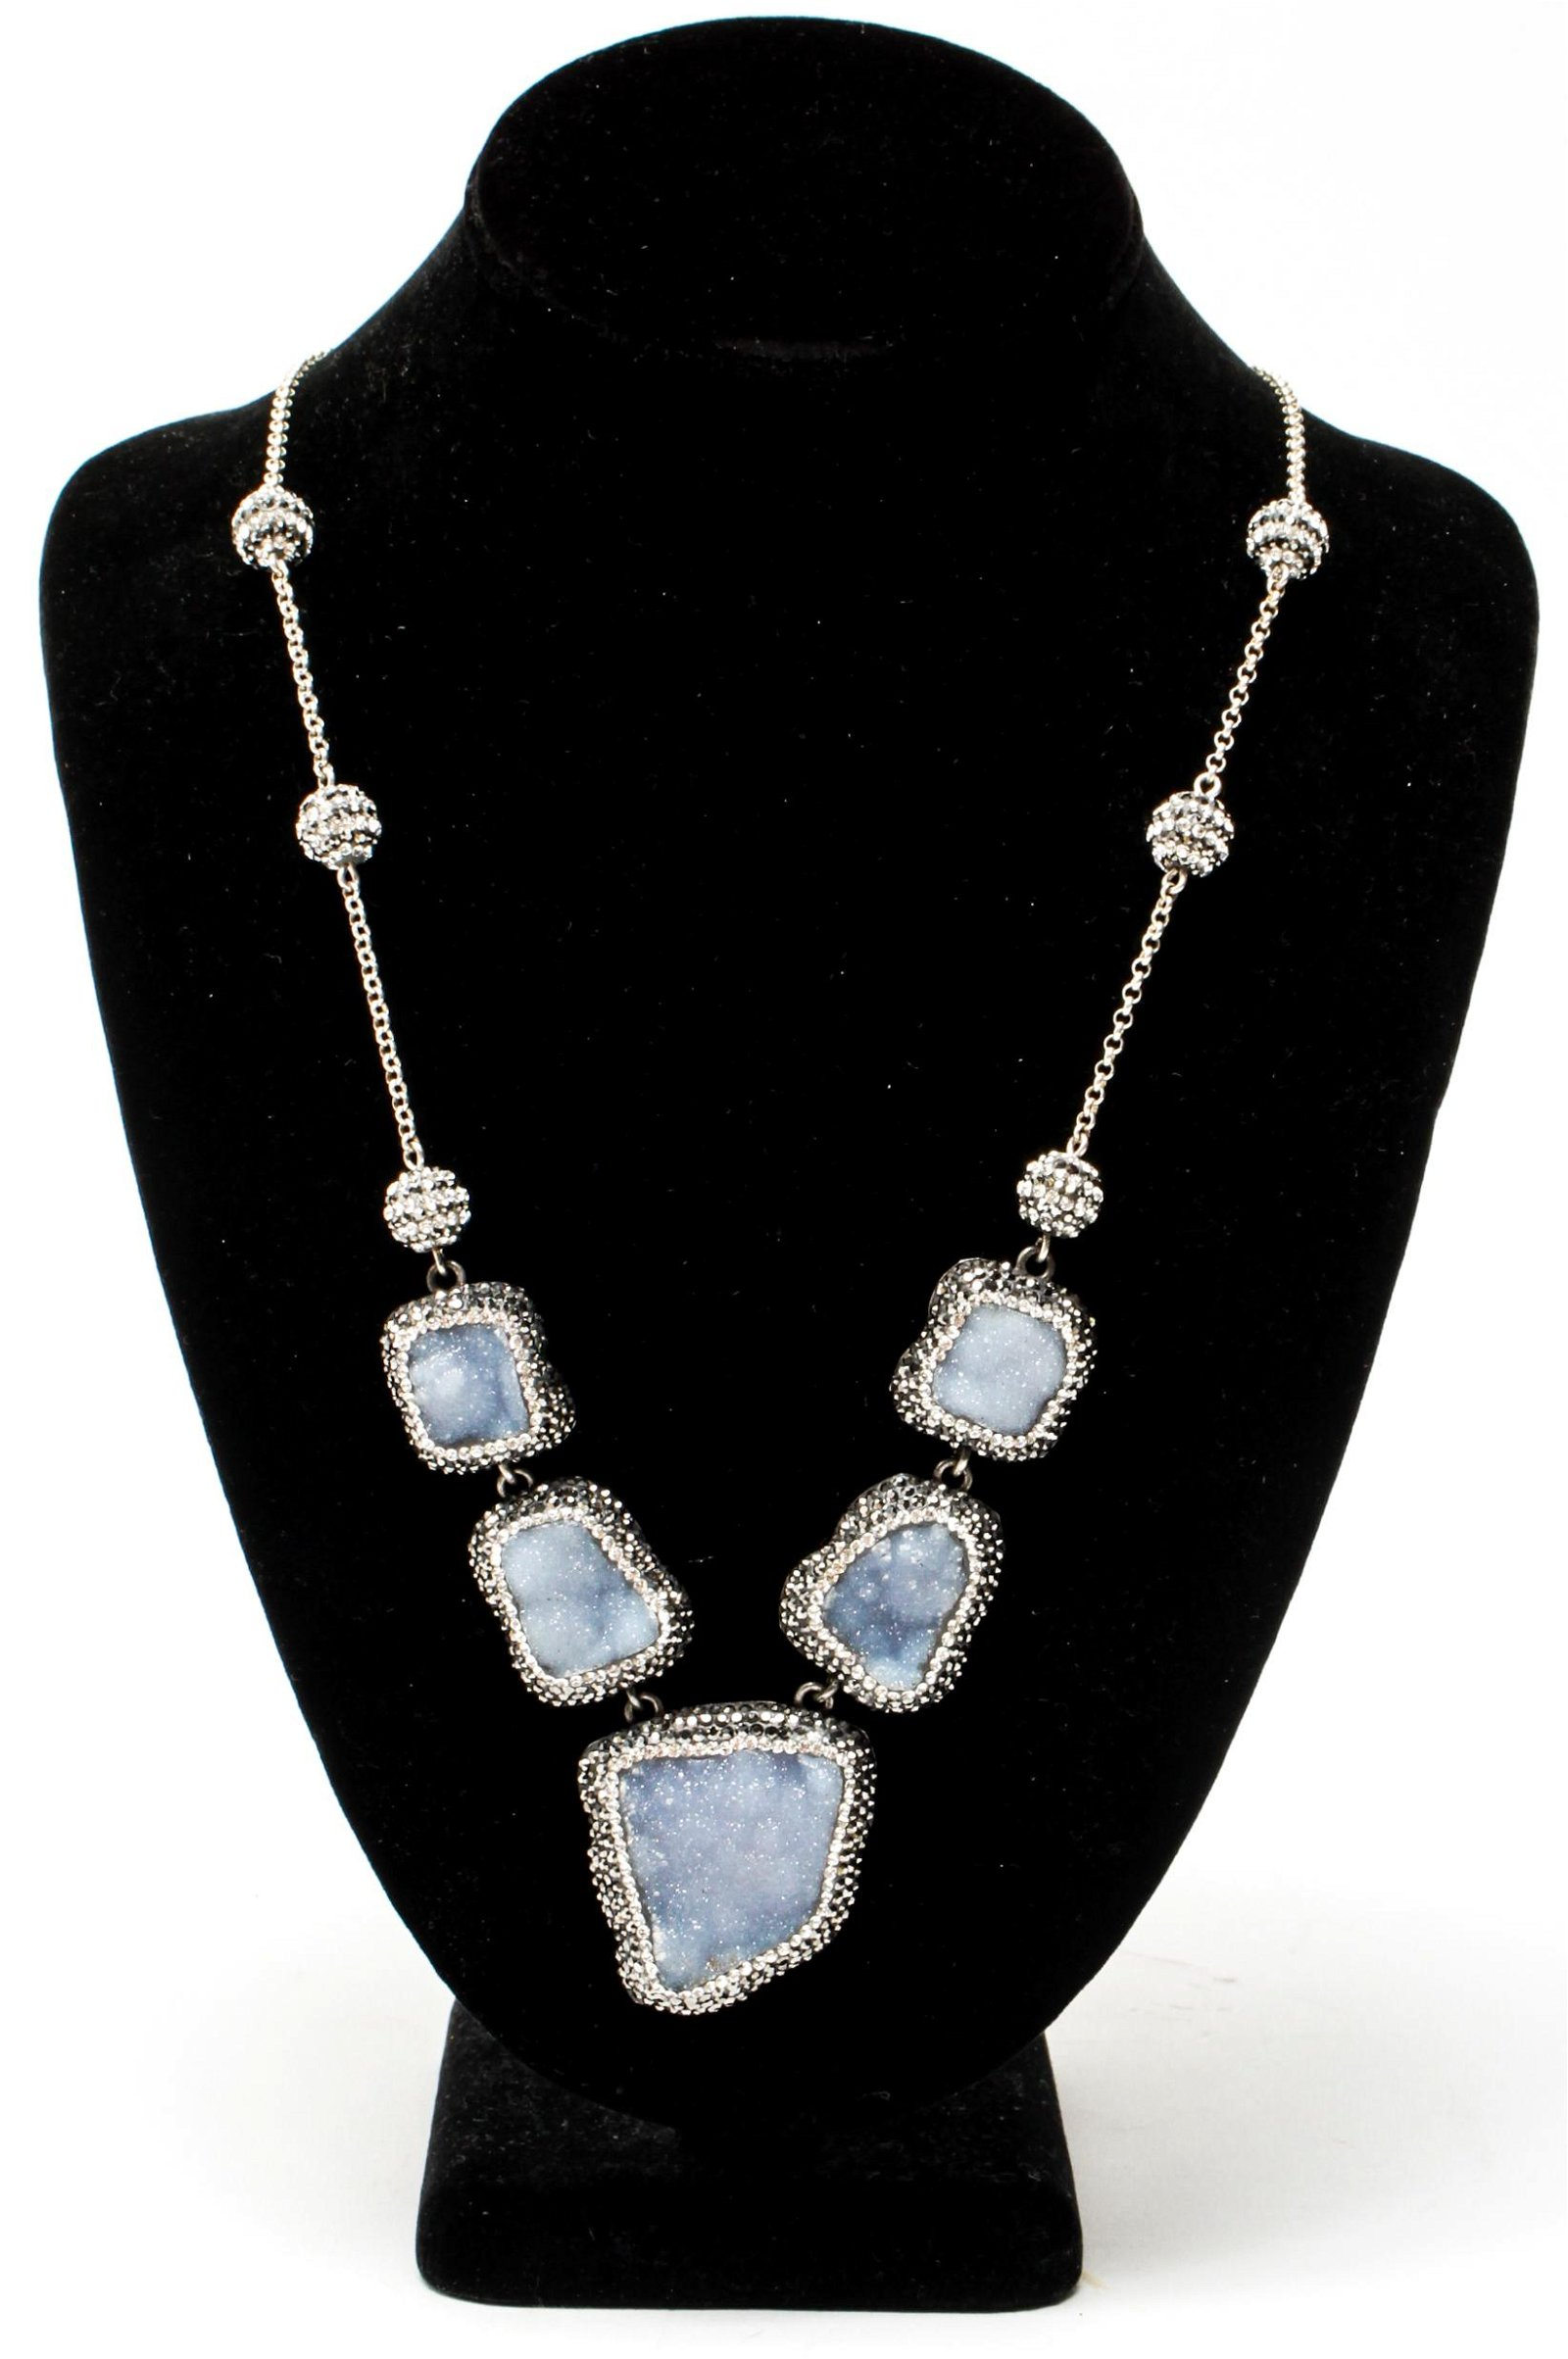 Silver Chalcedony Geode & Rhinestone Necklace